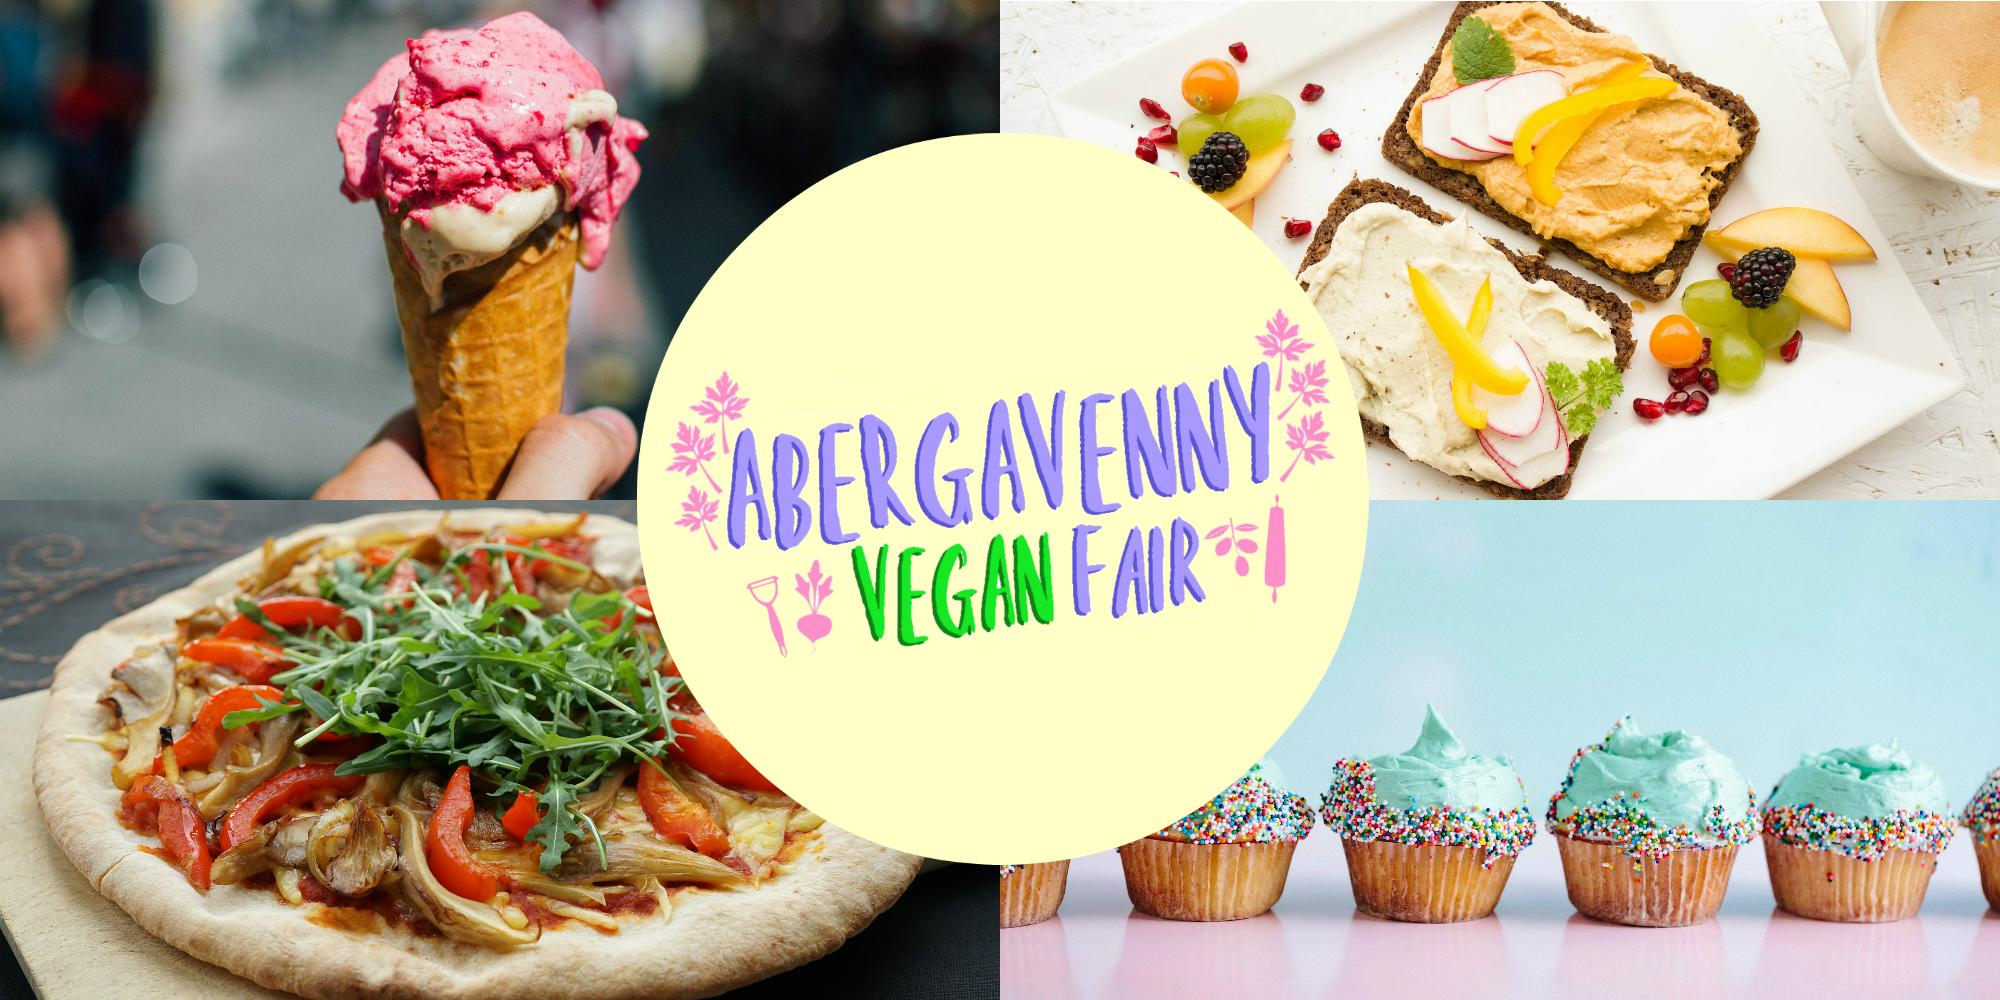 Abergavenny Vegan Fair 2019 cover.jpg